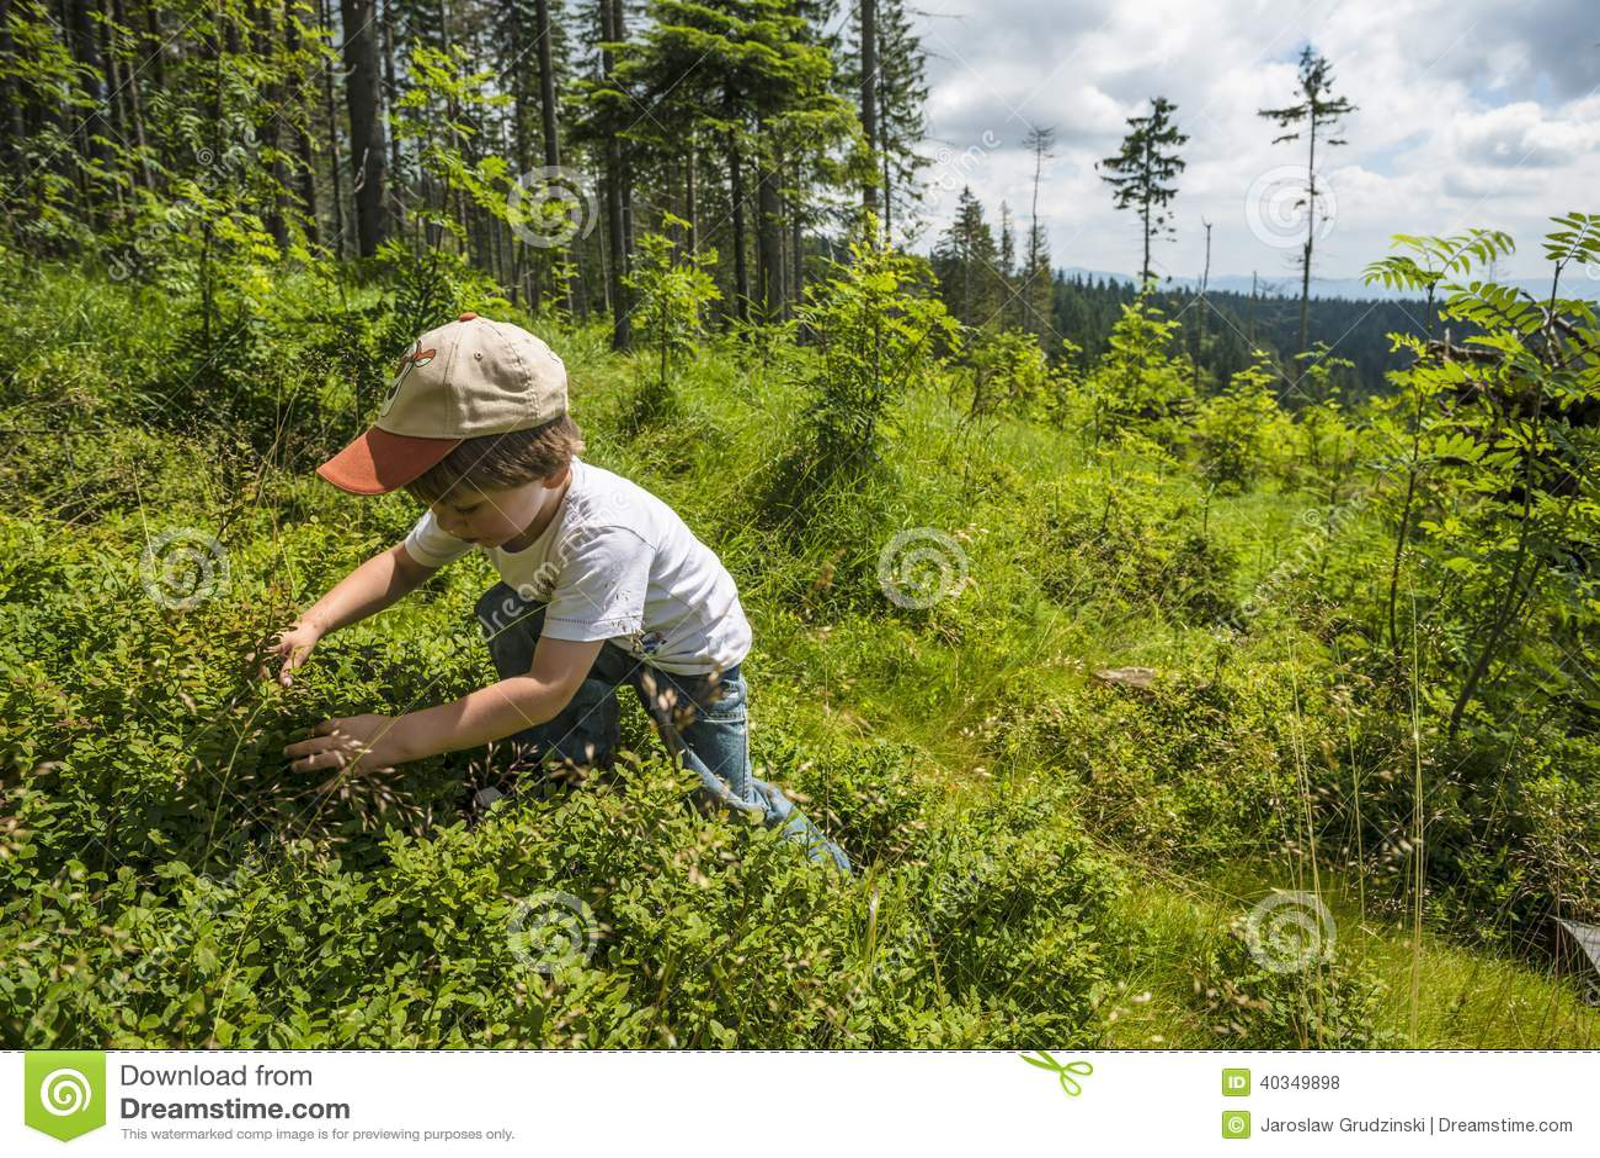 Picking bilberries